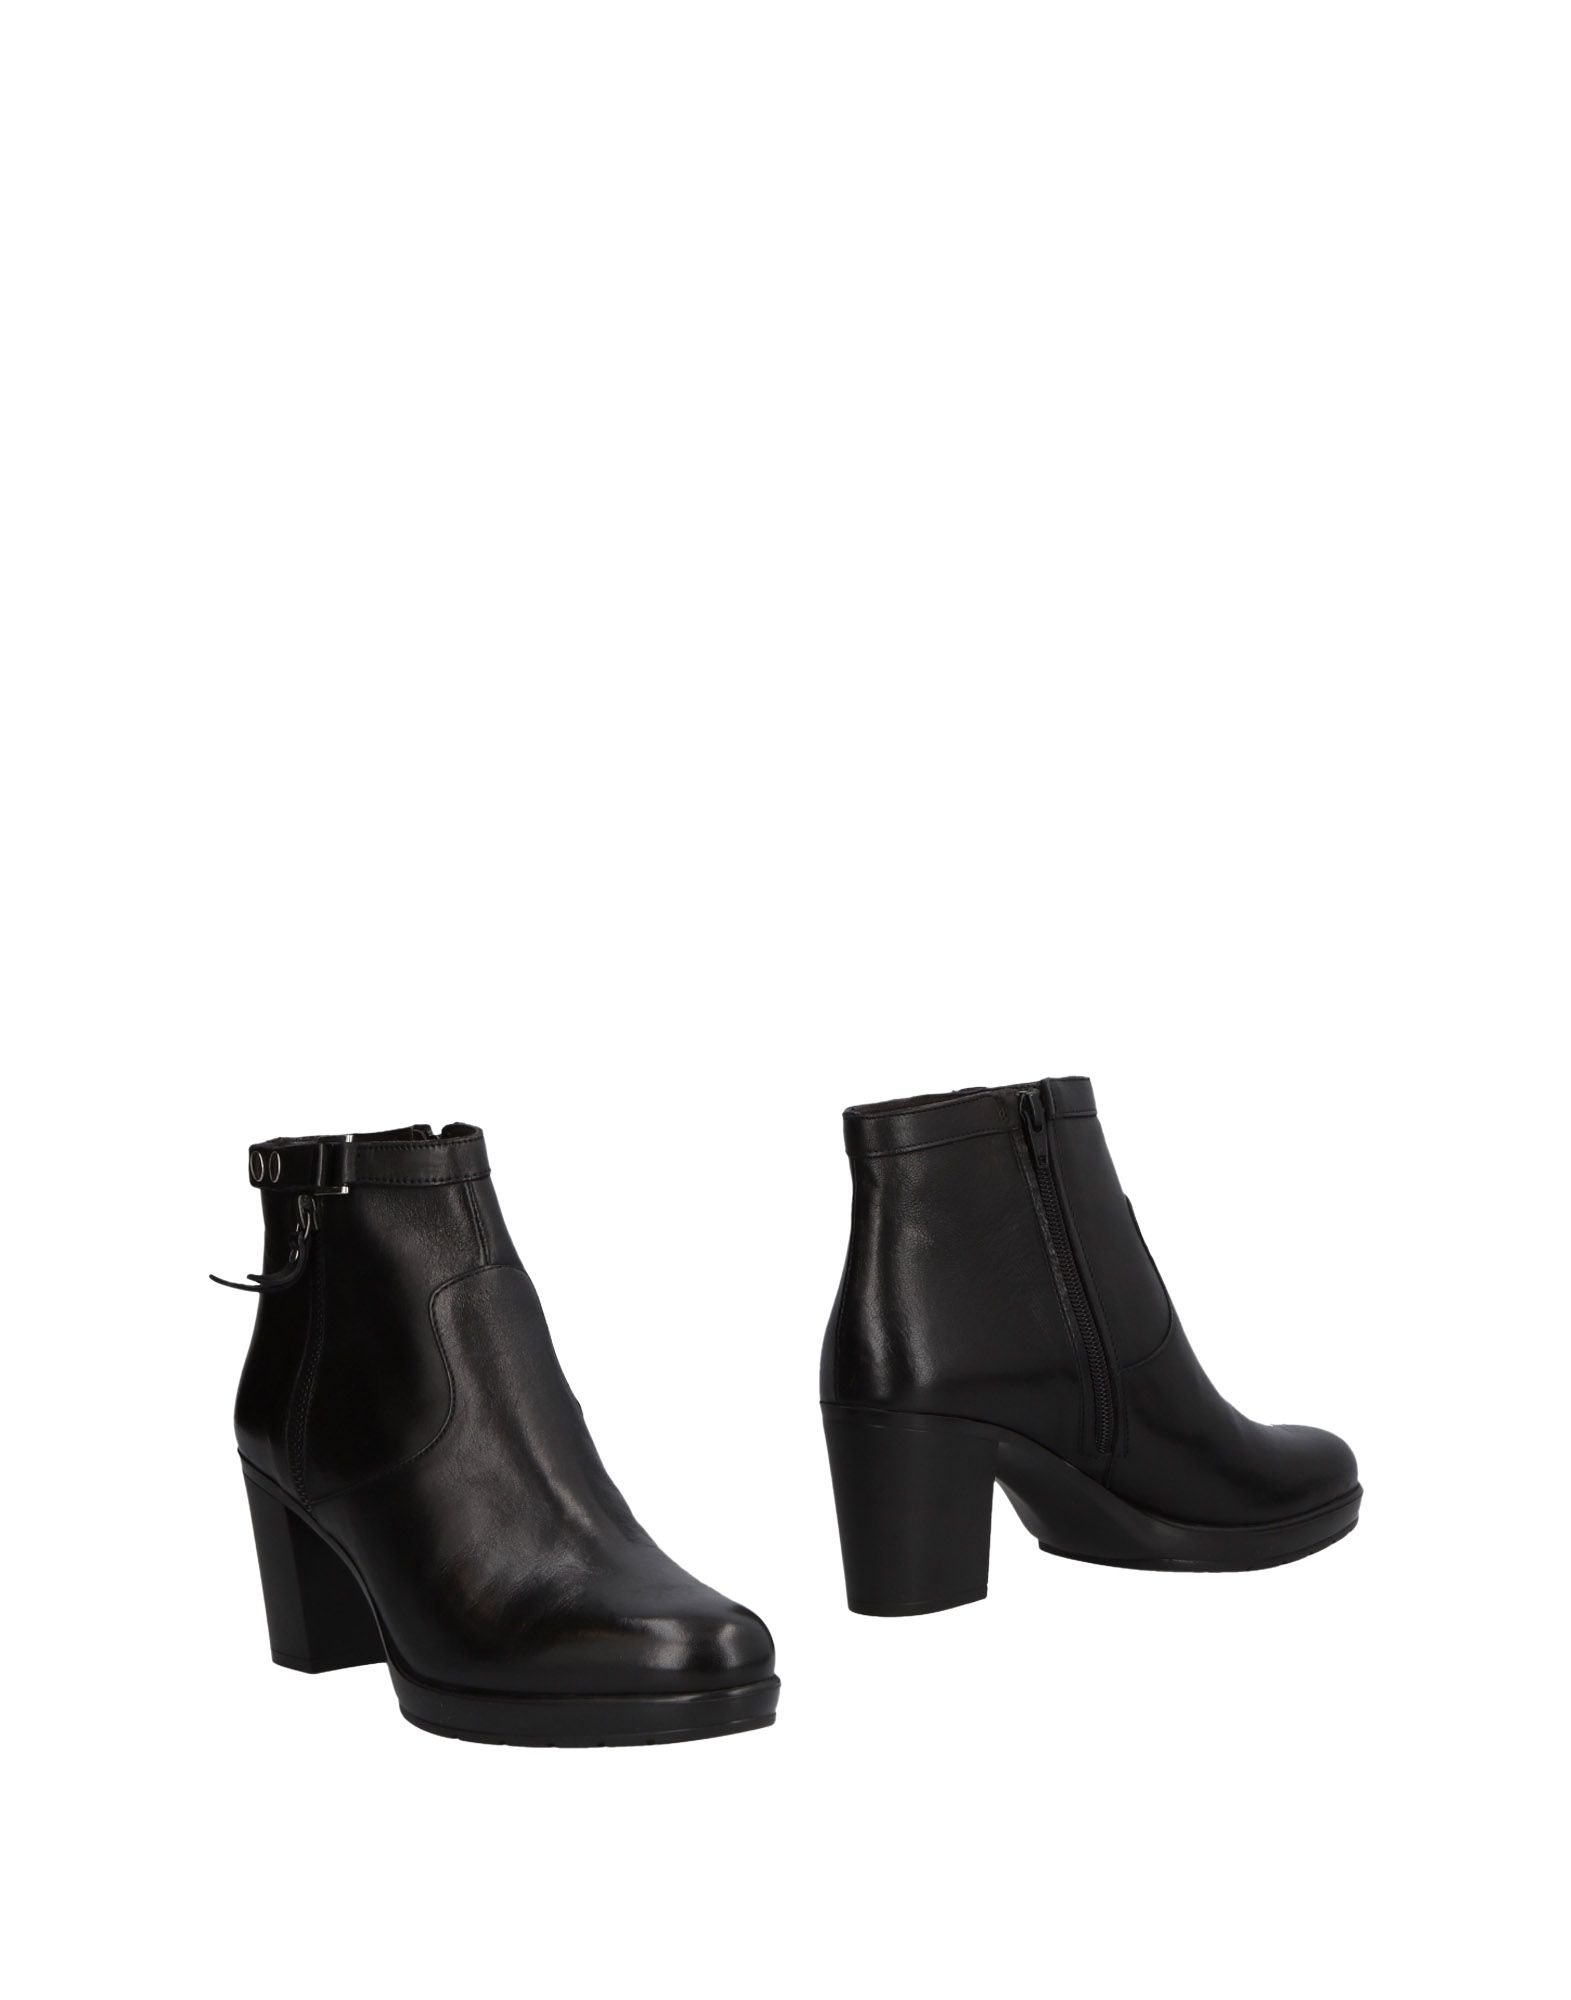 Triver Flight Stiefelette Damen beliebte  11481086DP Gute Qualität beliebte Damen Schuhe 413560